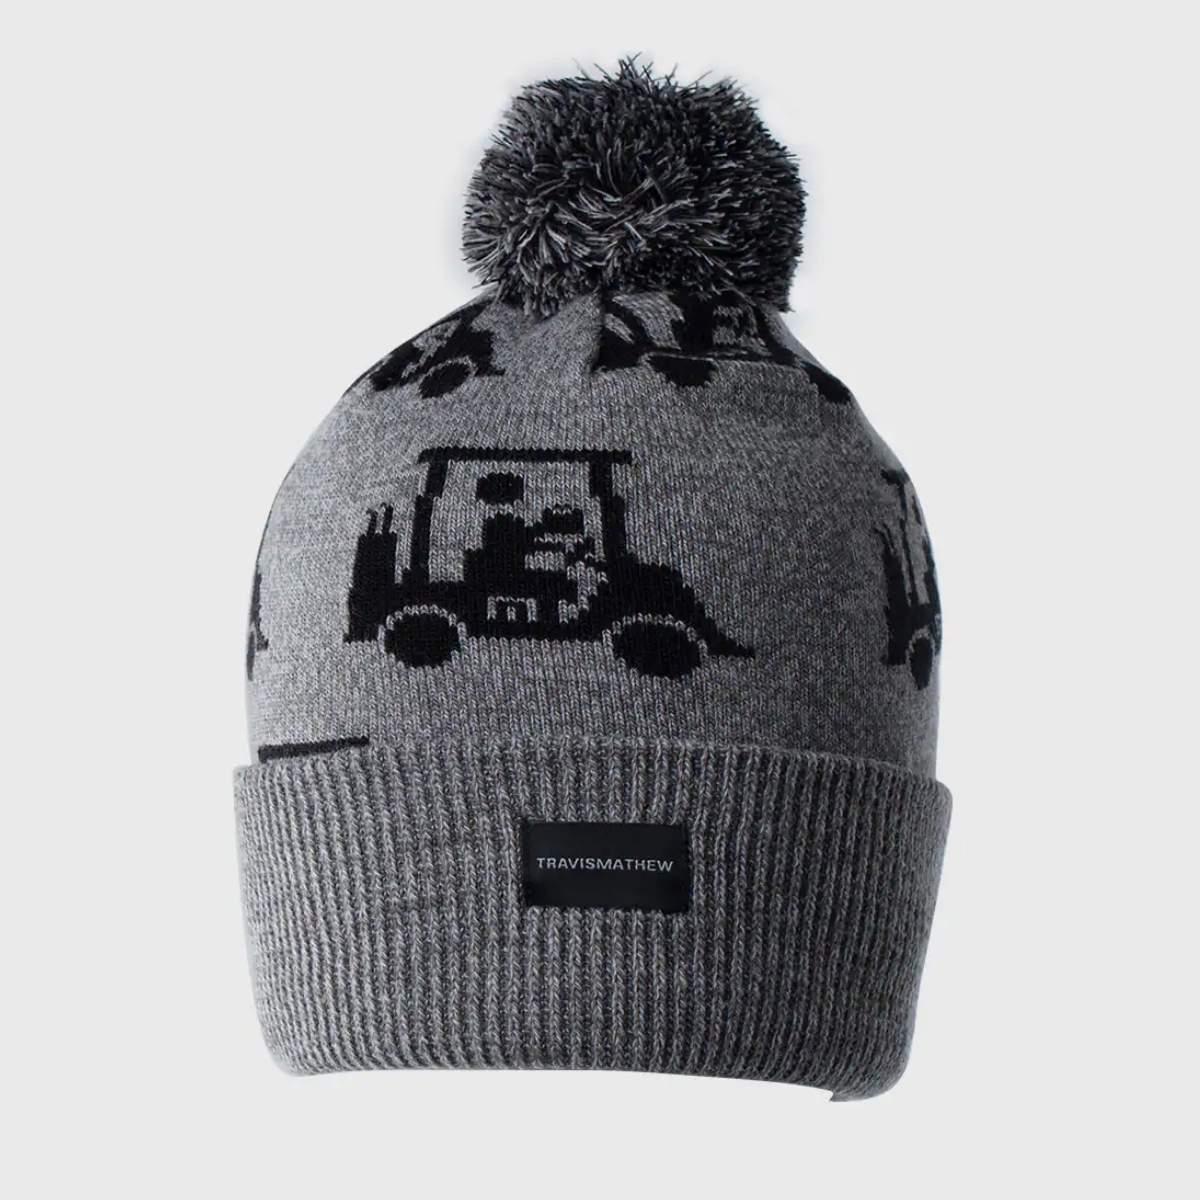 TravisMathew Swingles Beanie Hat